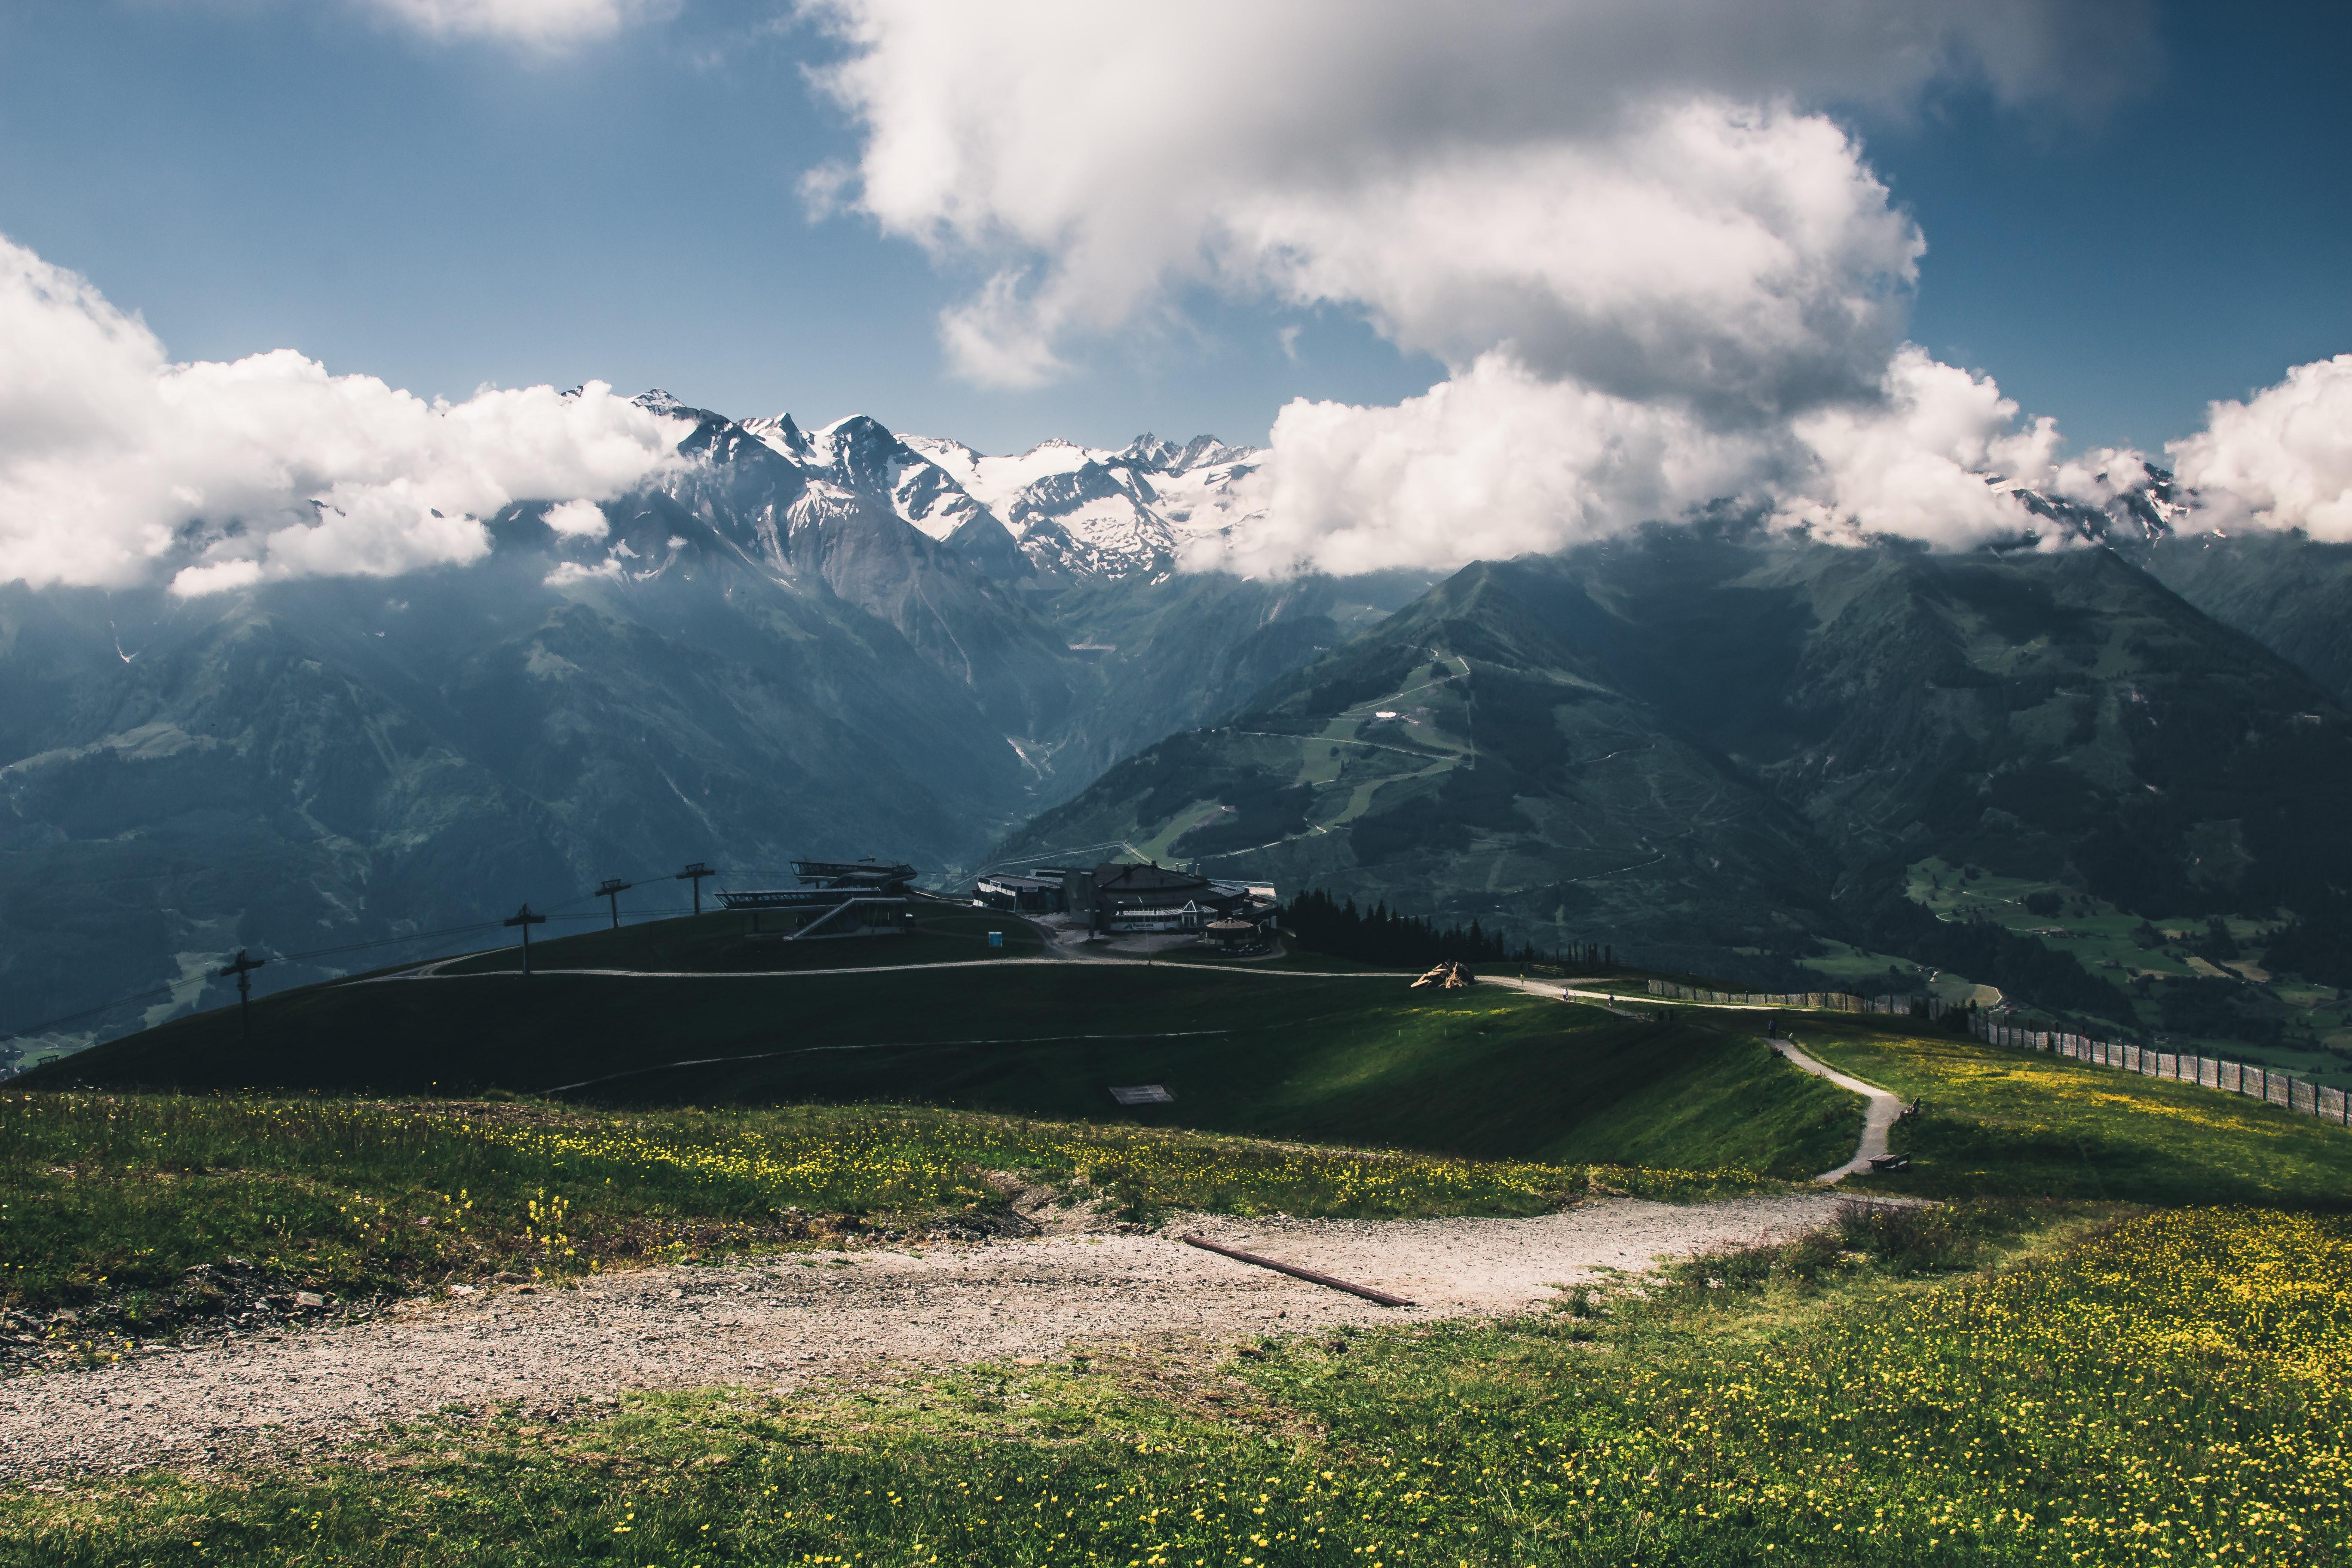 Best places for paragliding in Austria, Salzburg